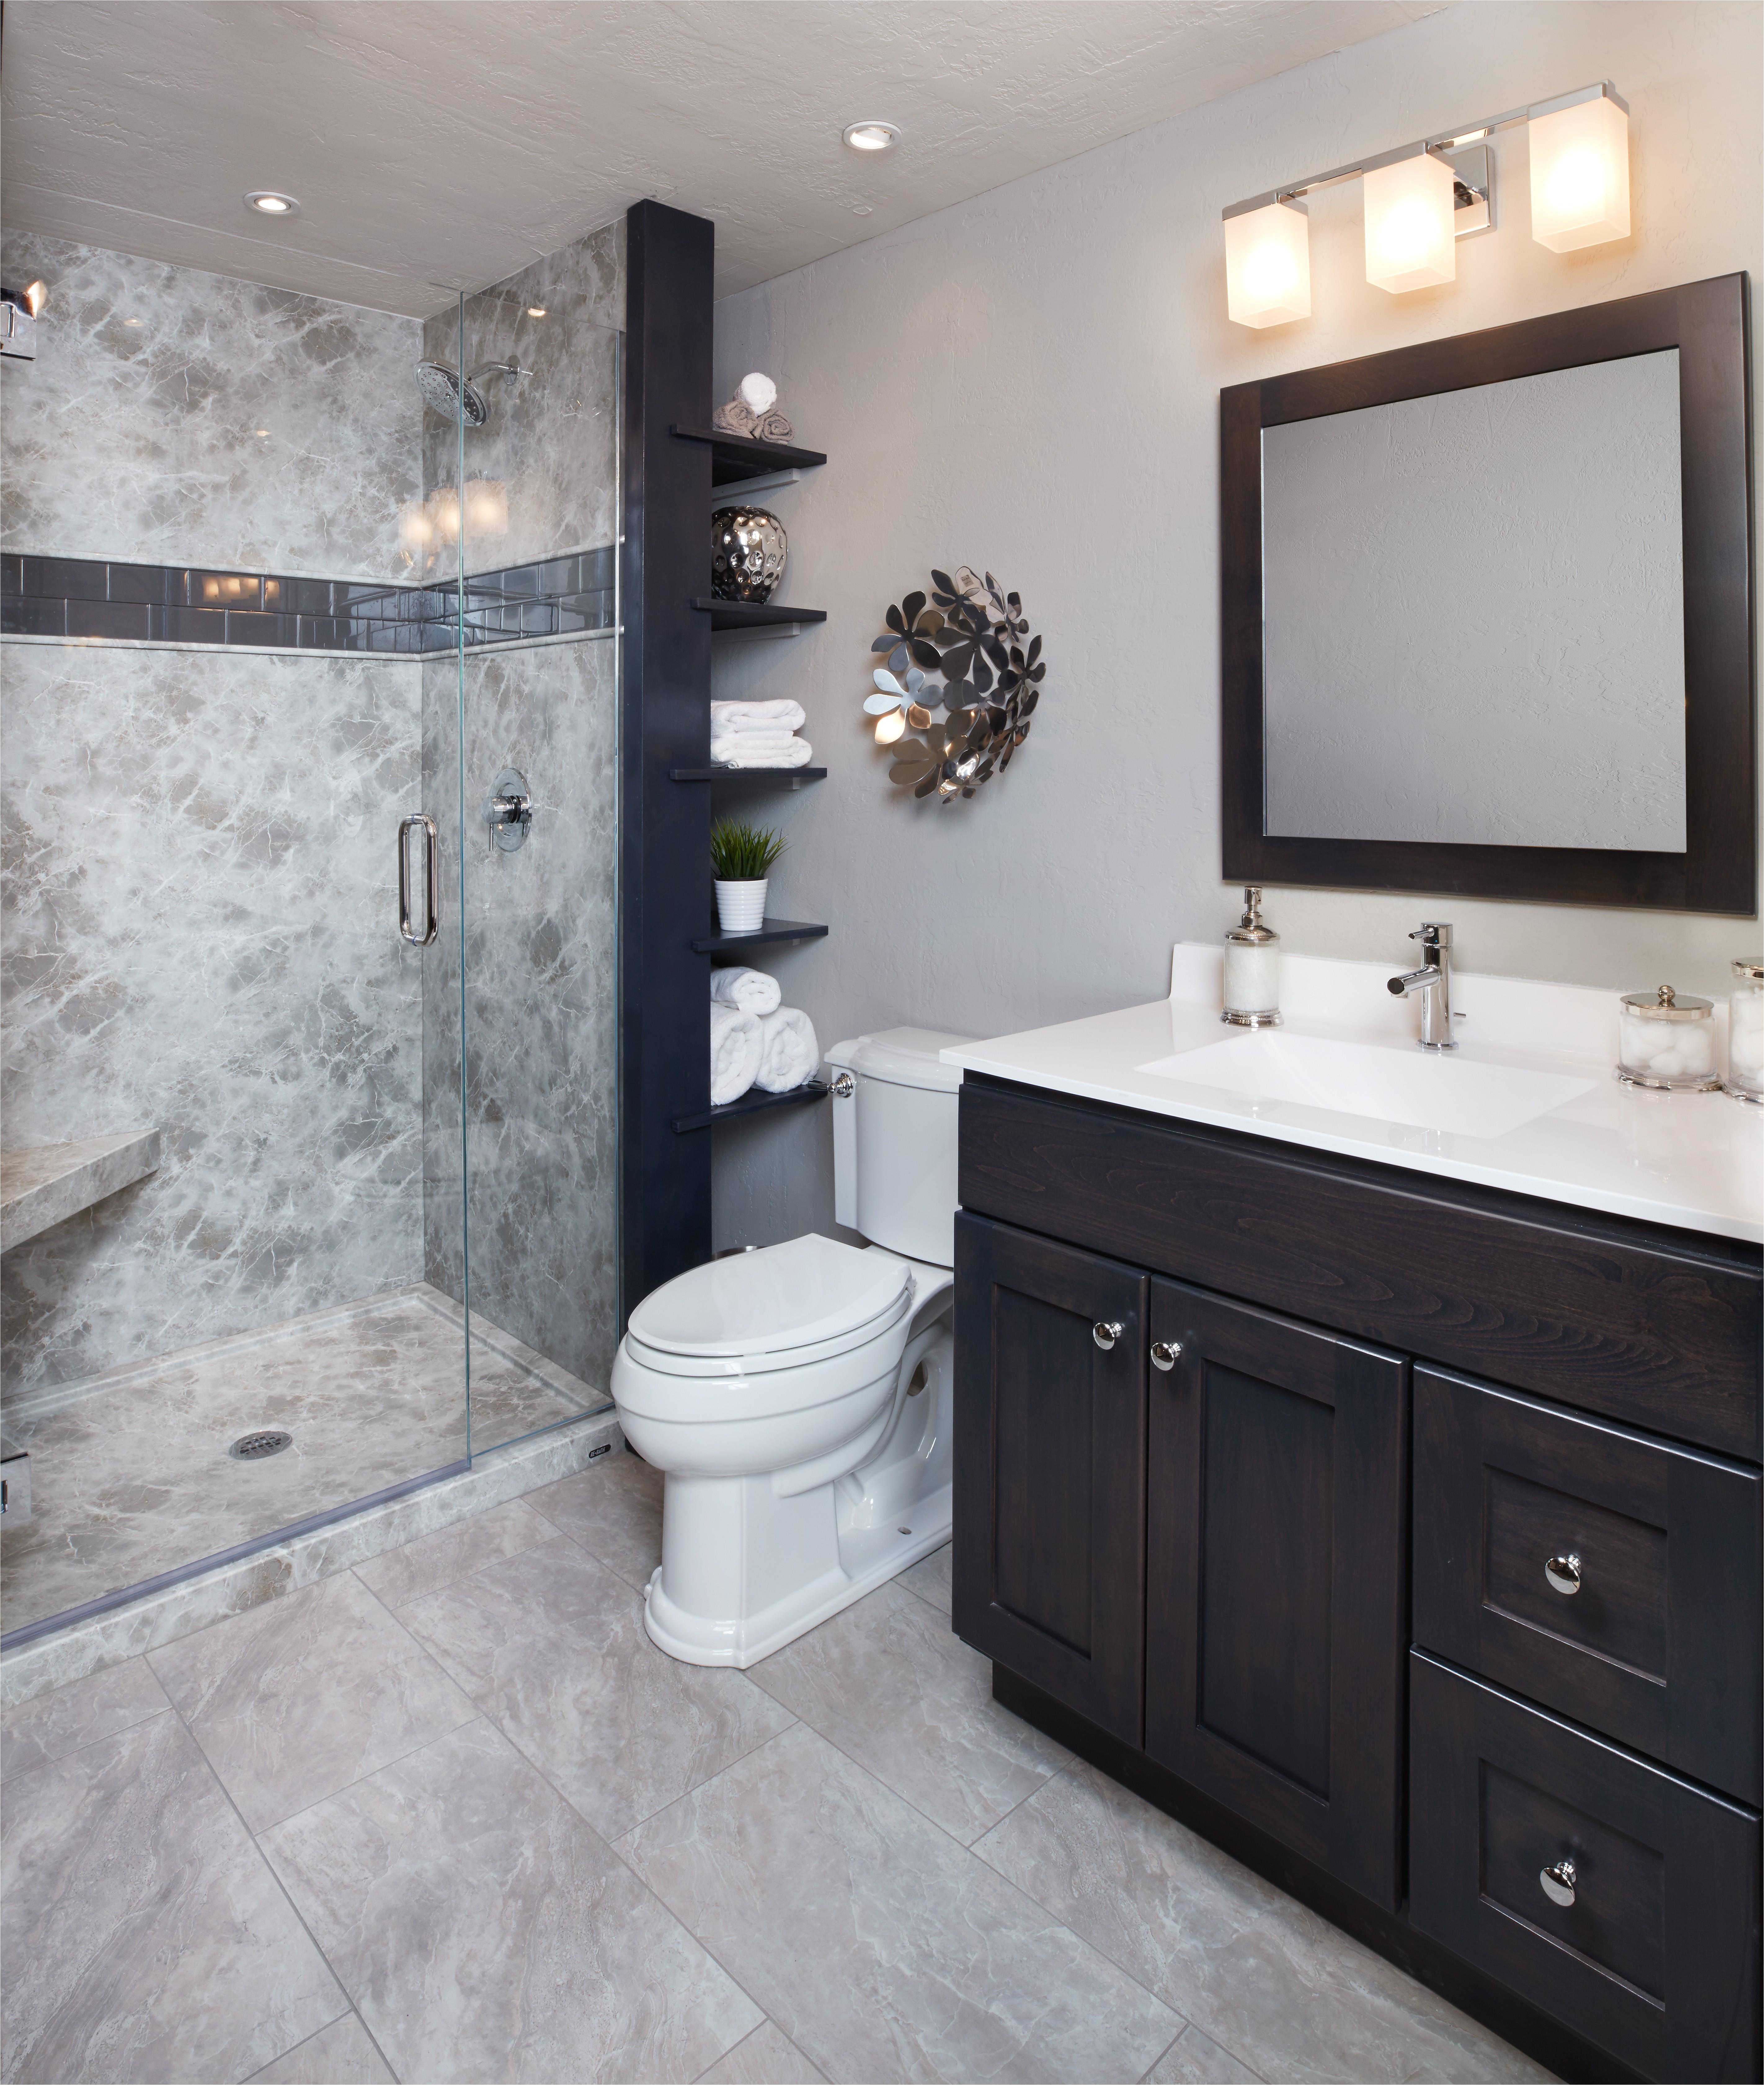 bathtub overlay lowes bathroom remodeling costs cool 27 new bathtub